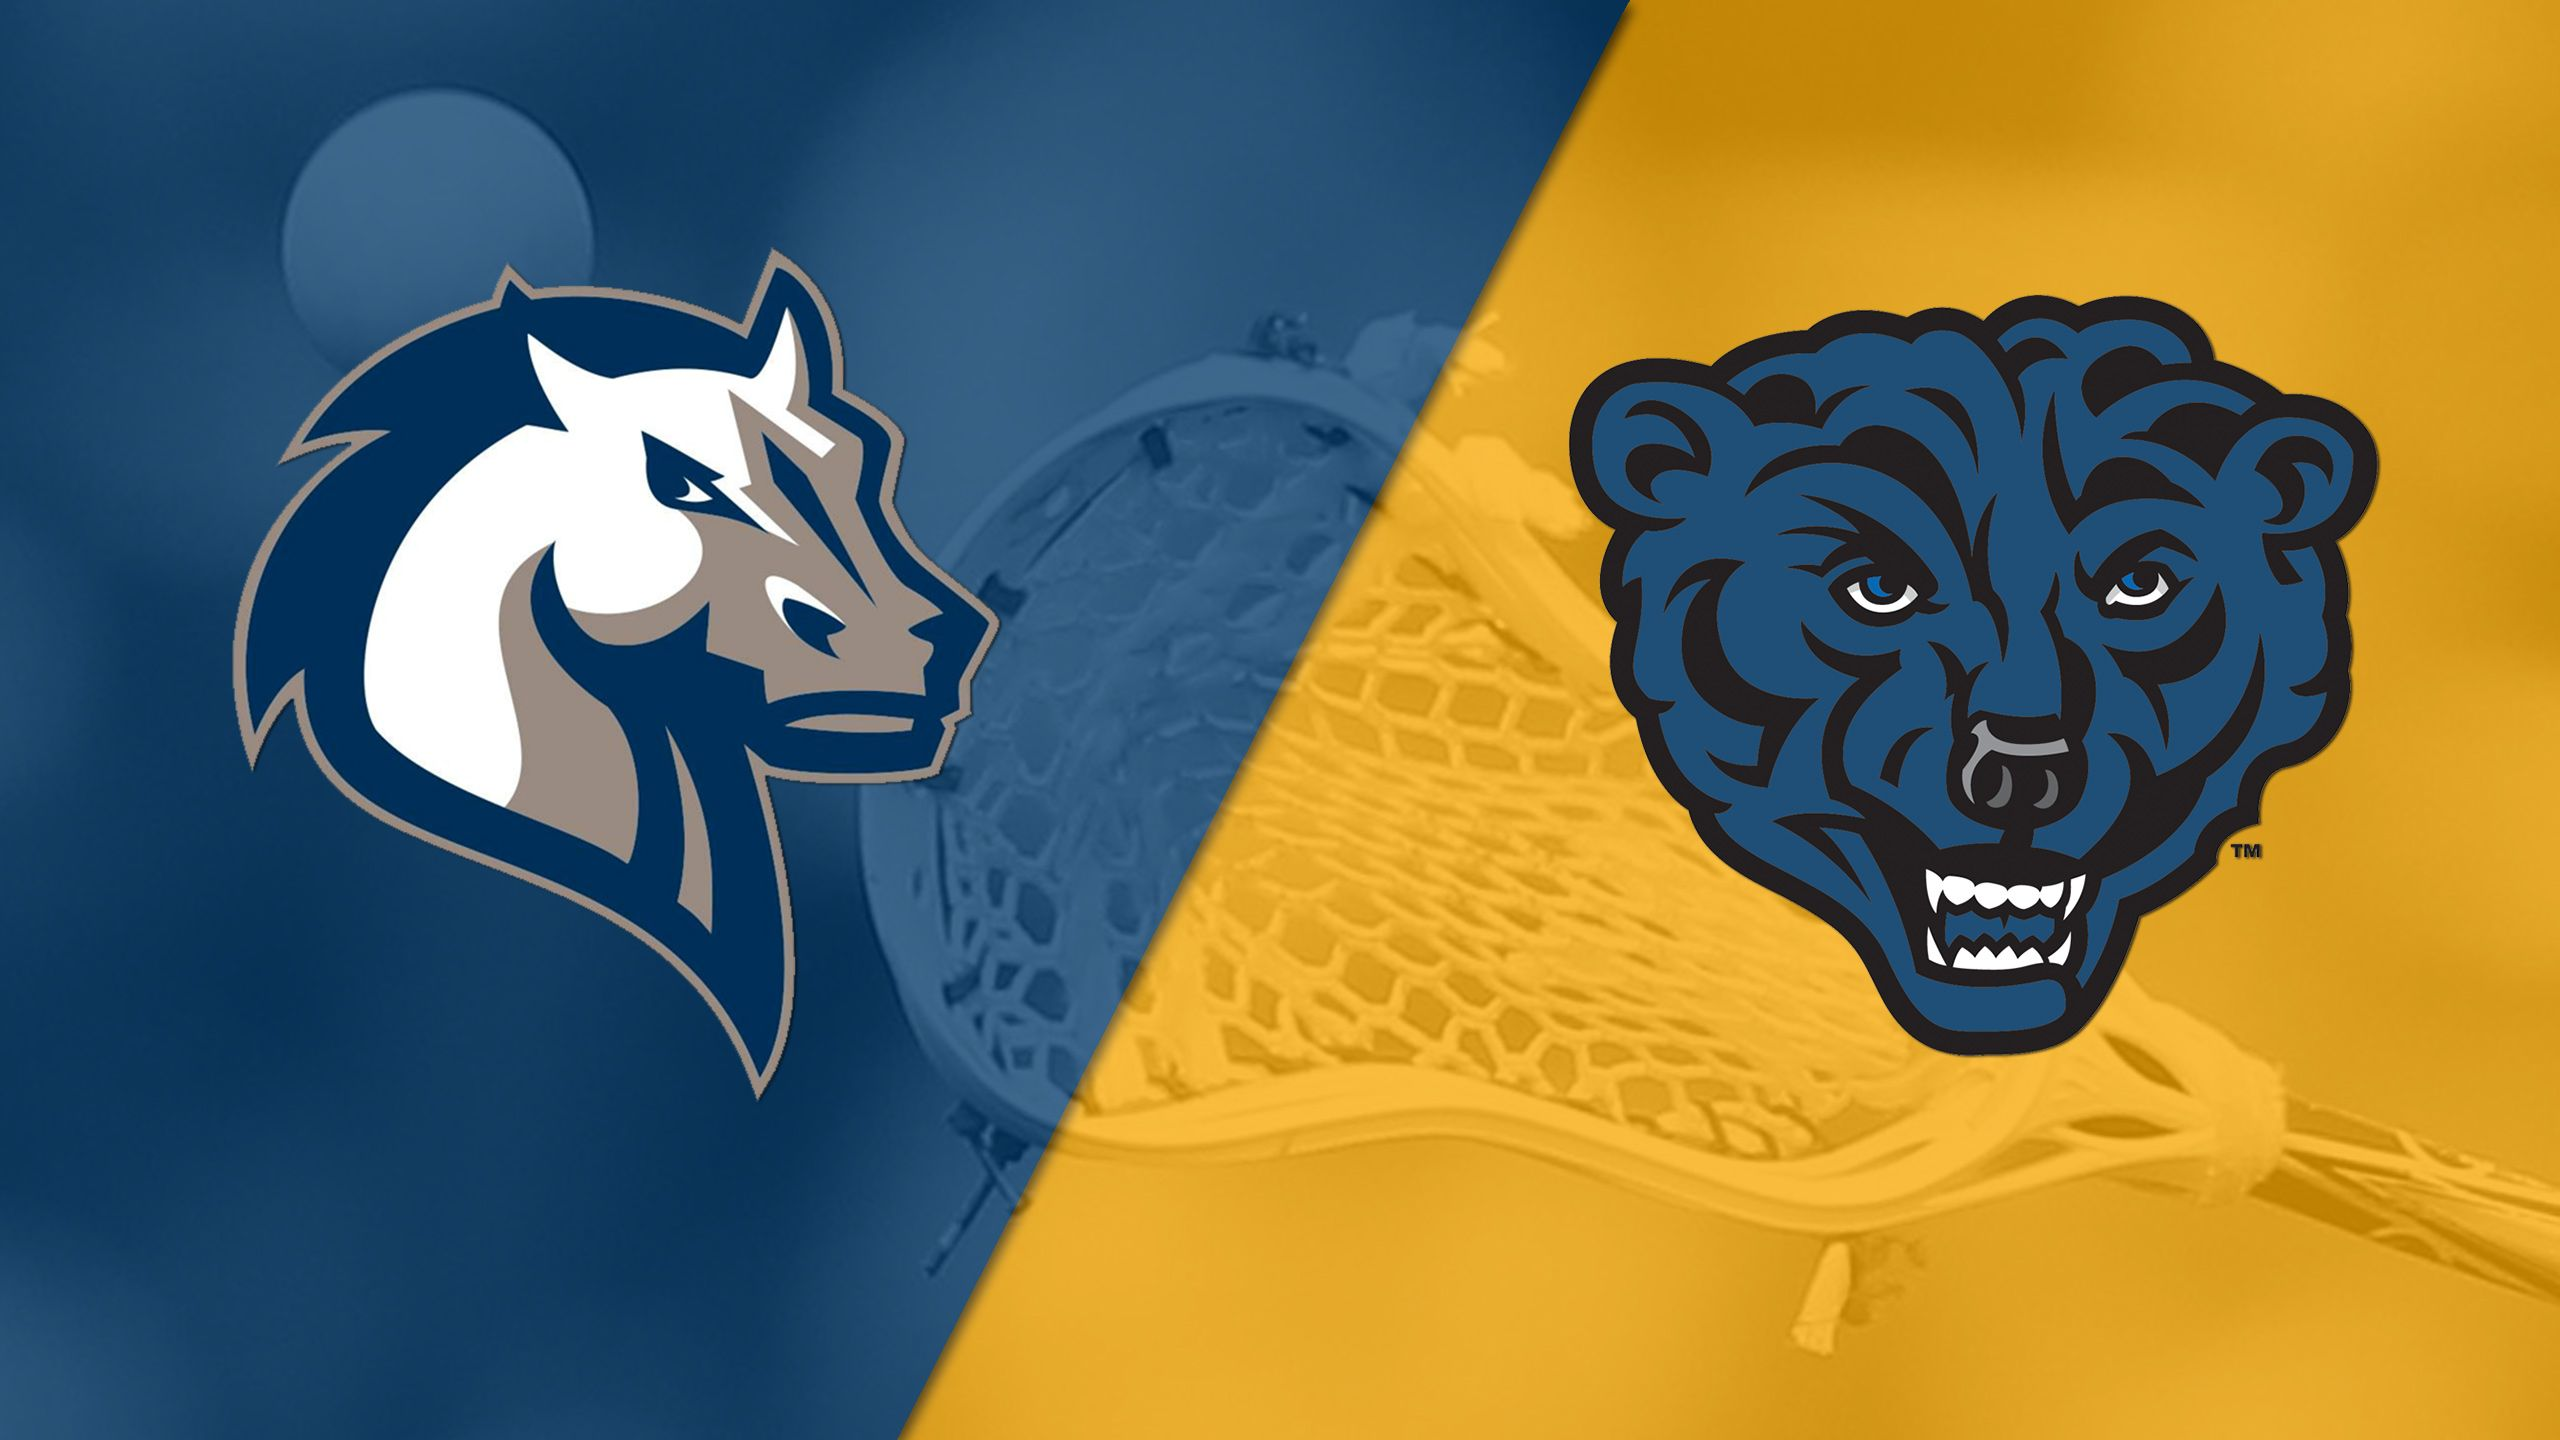 Mercy vs. NYIT (Championship) (East Coast Conference Men's Lacrosse Championship)